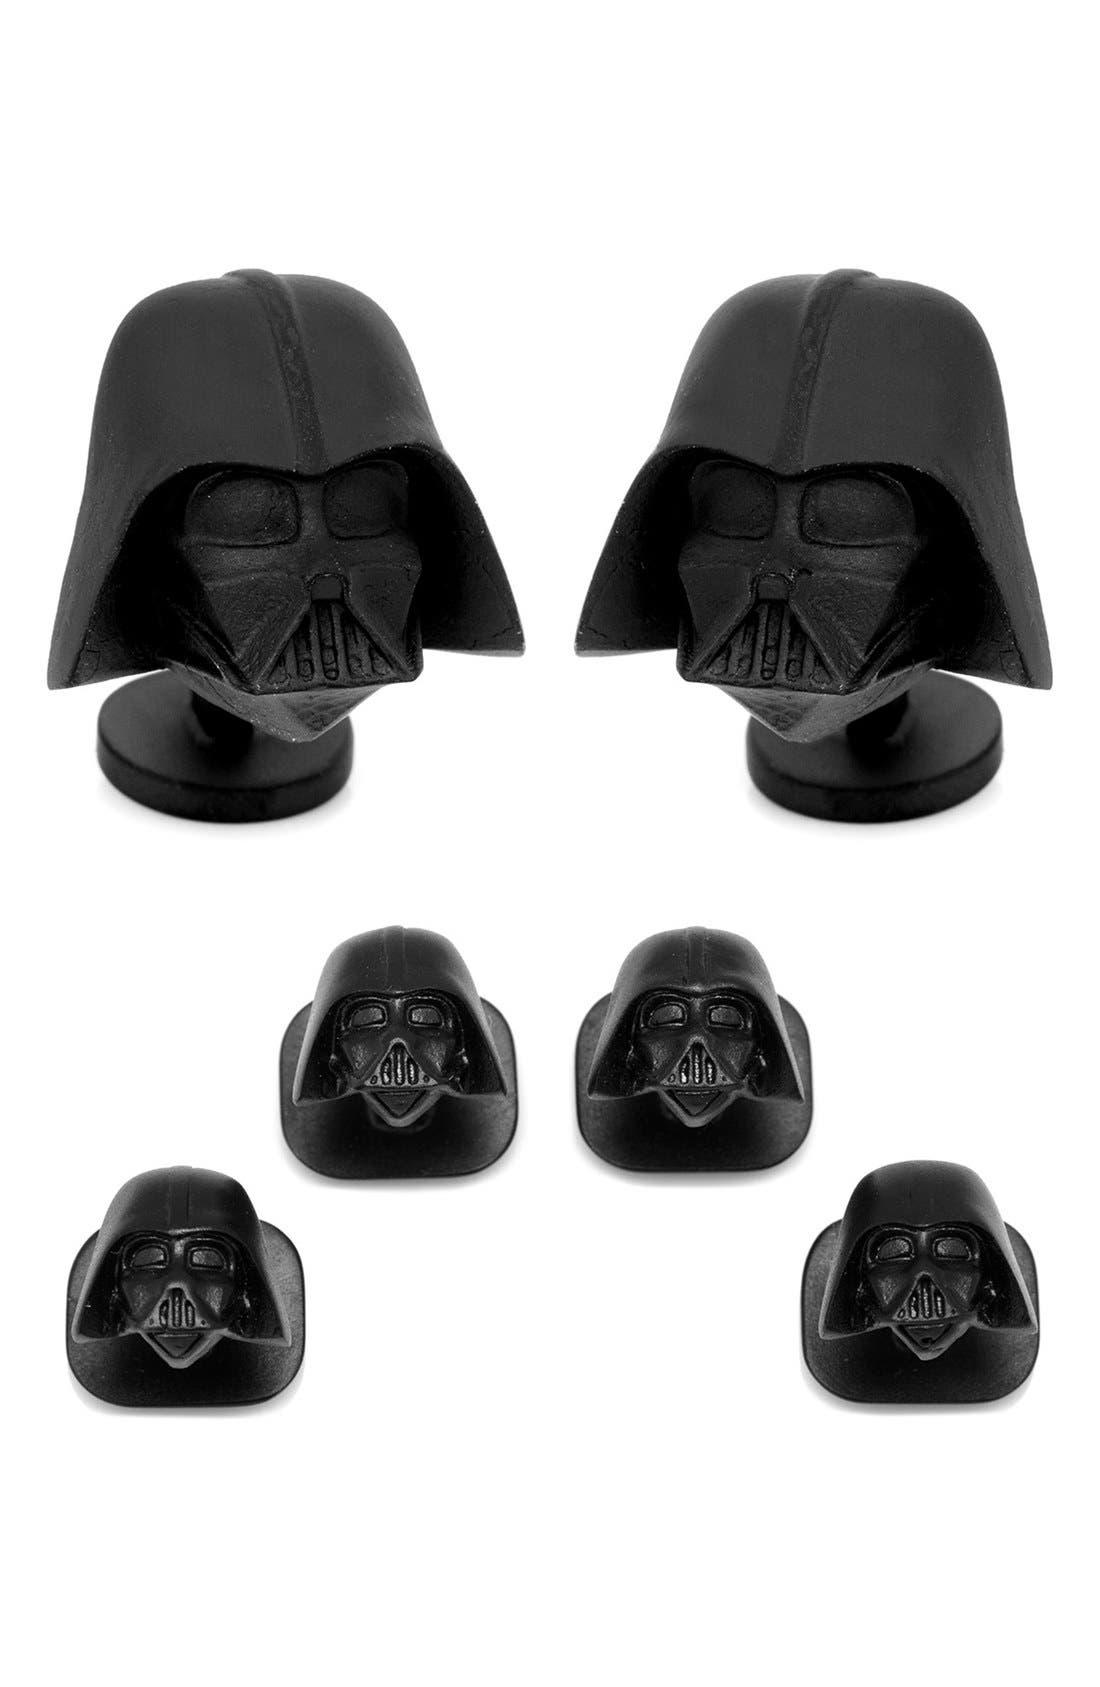 CUFFLINKS, INC. 'Star Wars -Darth Vader' Cuff Links & Shirt Studs Set, Main, color, 001